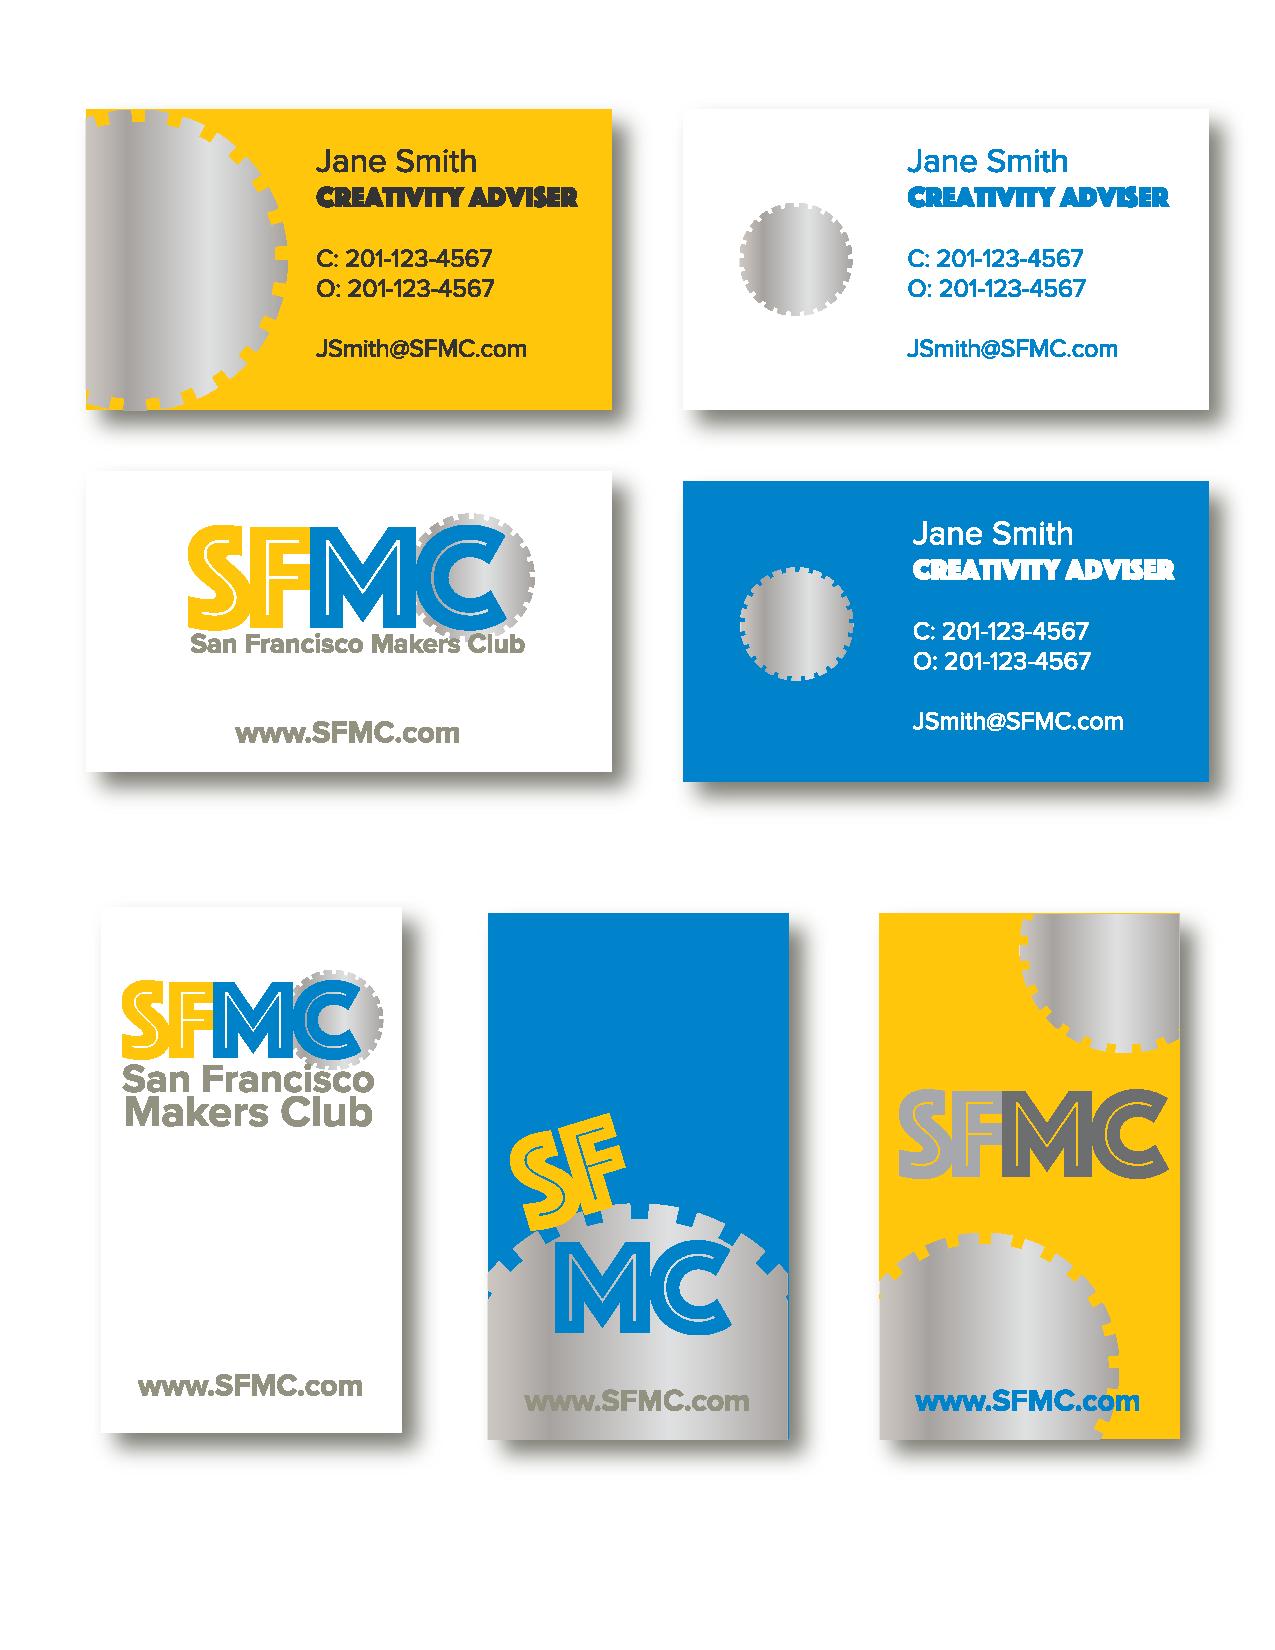 SFMC_Page_4